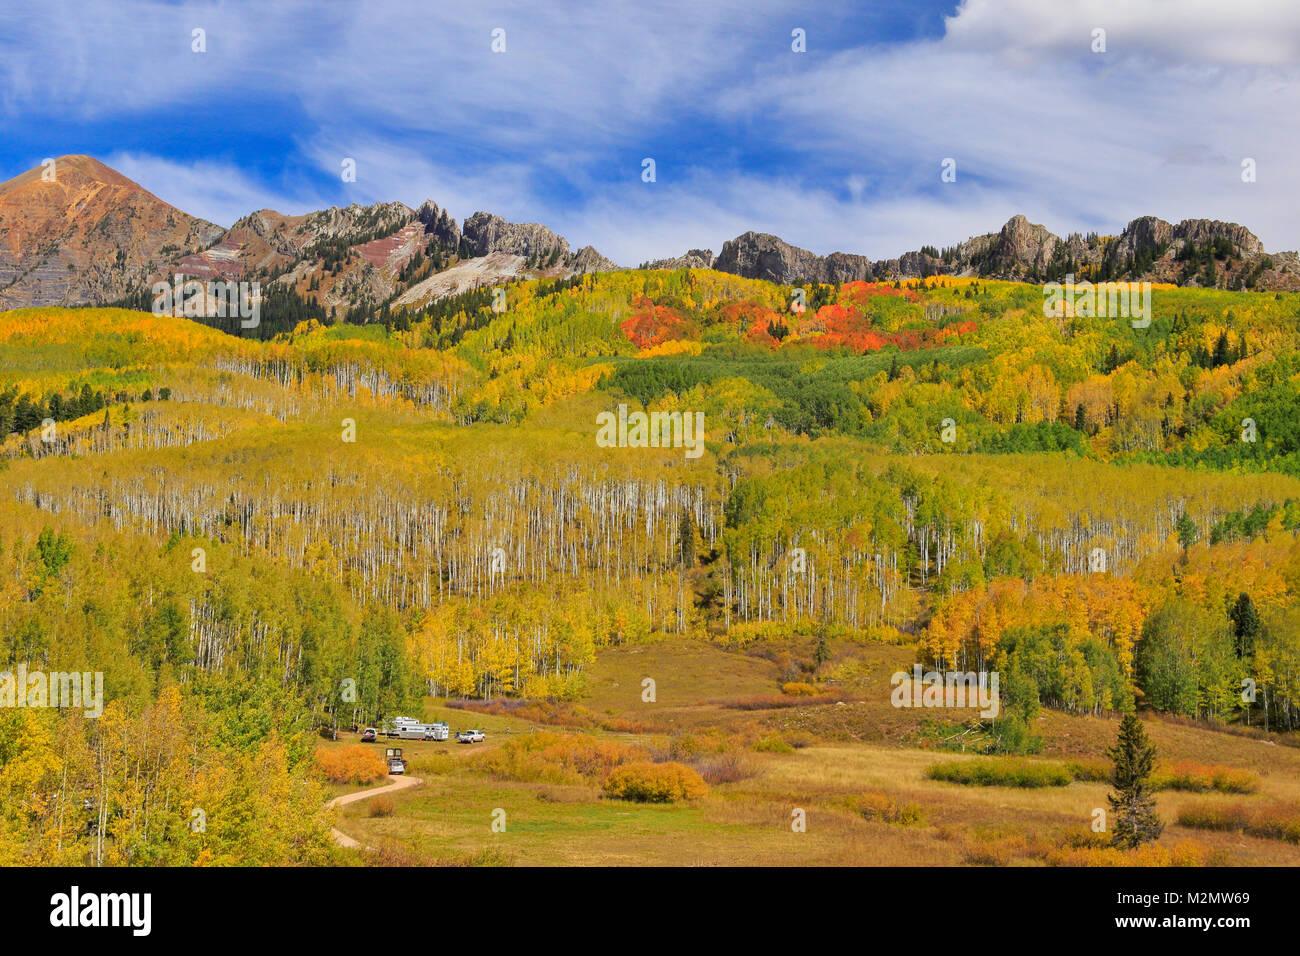 Aspens, Kebler Pass, Crested Butte, Colorado, USA - Stock Image